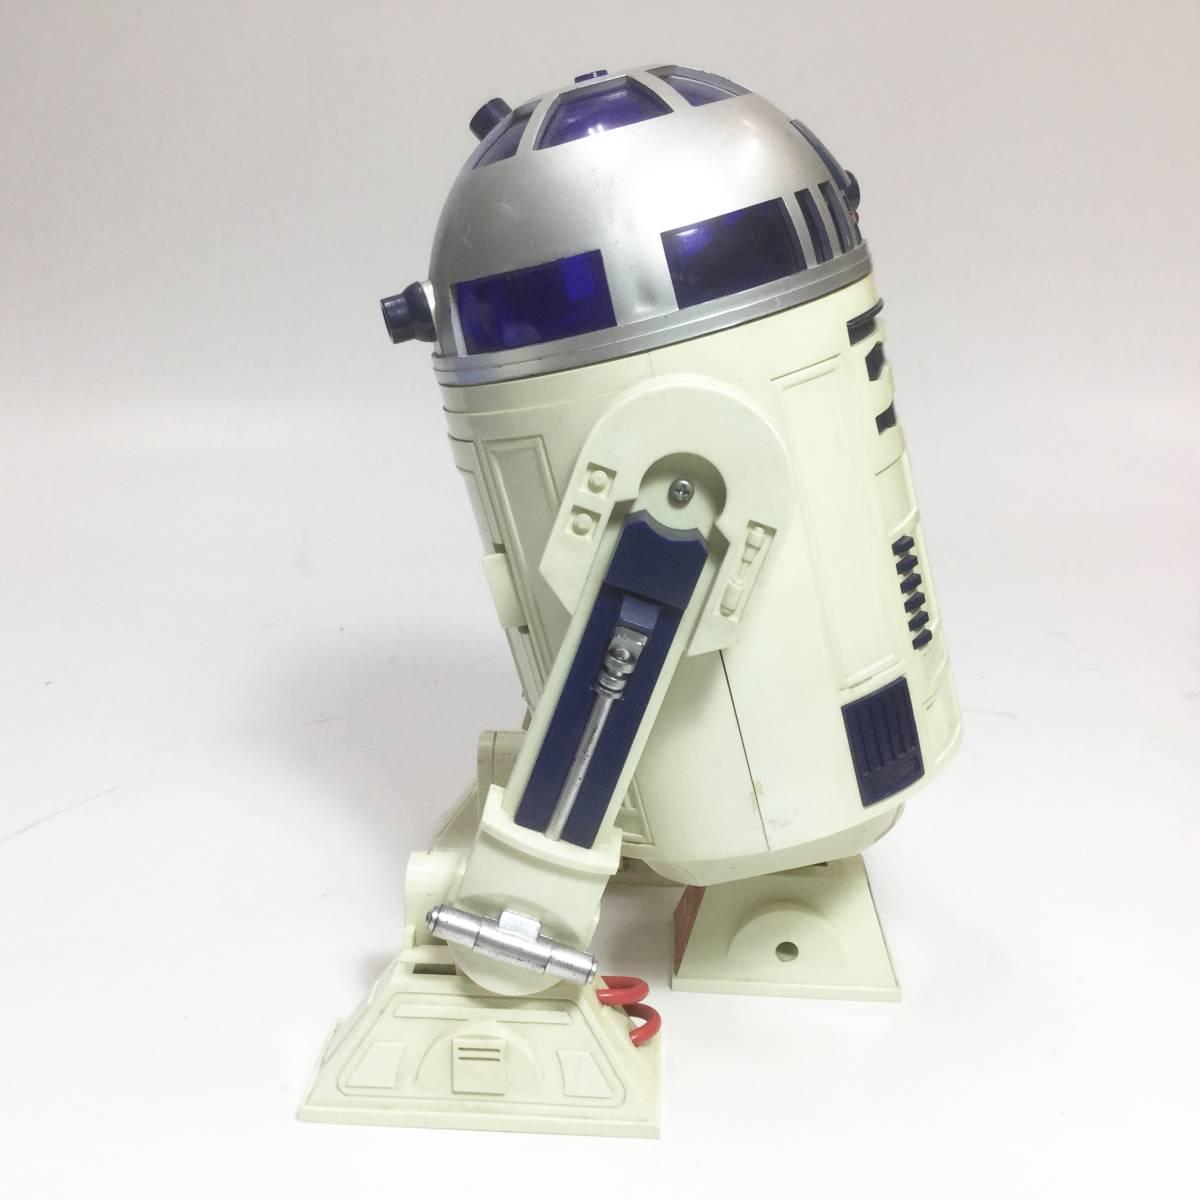 R2-D2 ラジオ 作動品 スターウォーズ 1977年版 コカコーラ 懸賞品 非売品 レトロ ビンテージ _画像4